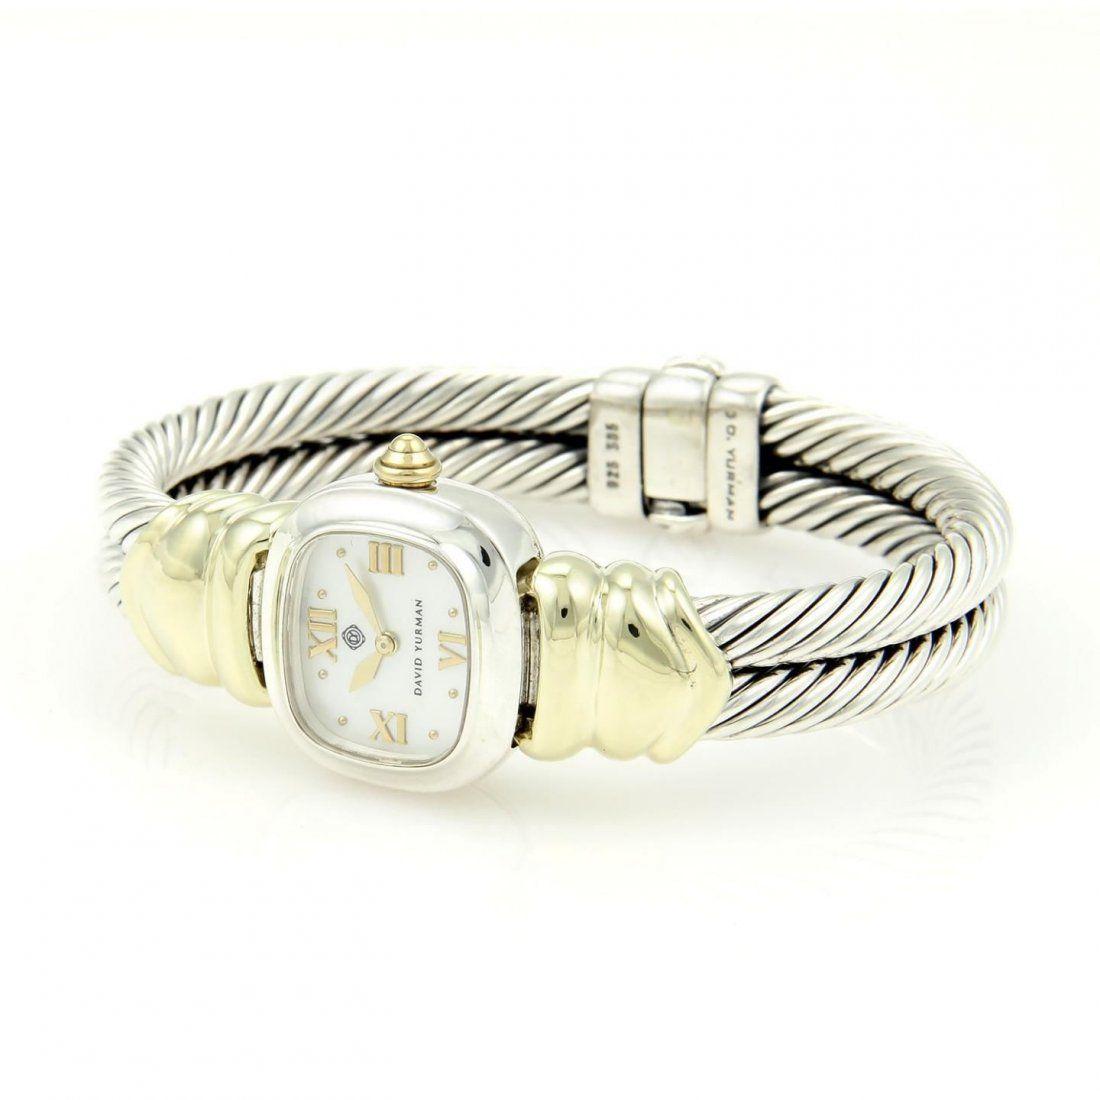 David Yurman 925 Silver 14k YGold Ladies Wrist Watch